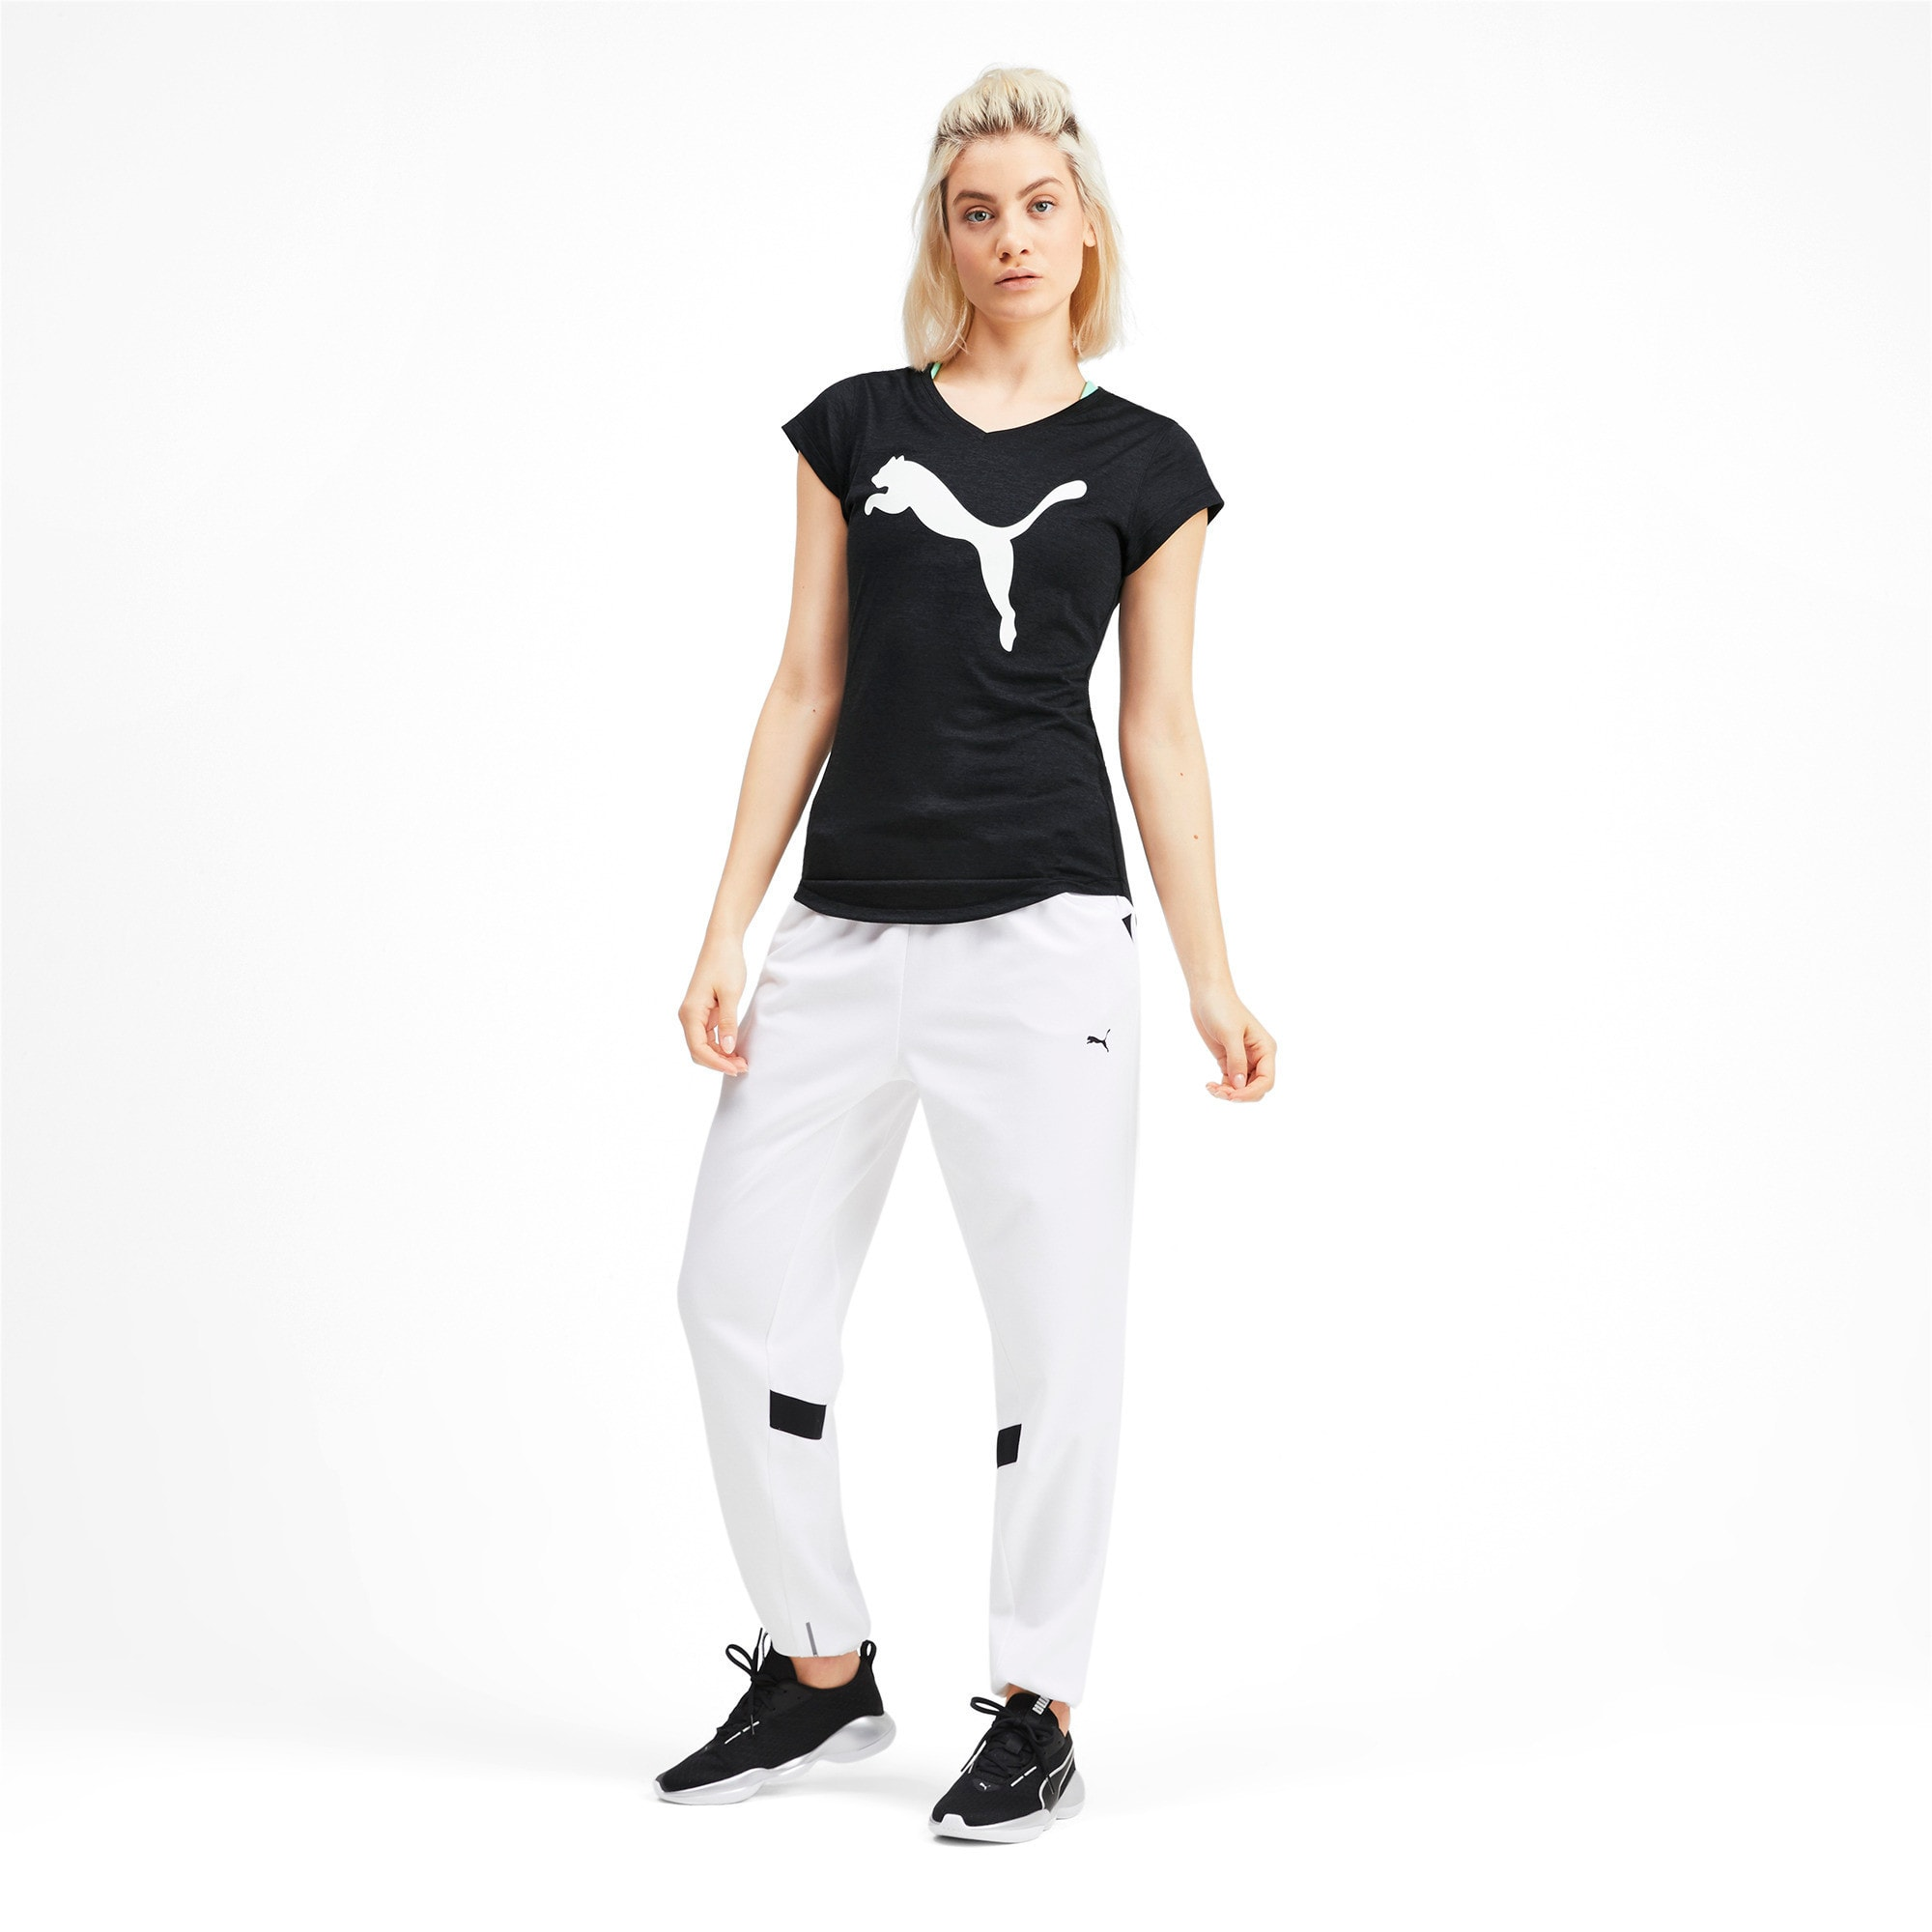 Thumbnail 3 of ヘザー キャット ウィメンズ ランニング Tシャツ 半袖, Puma Black, medium-JPN